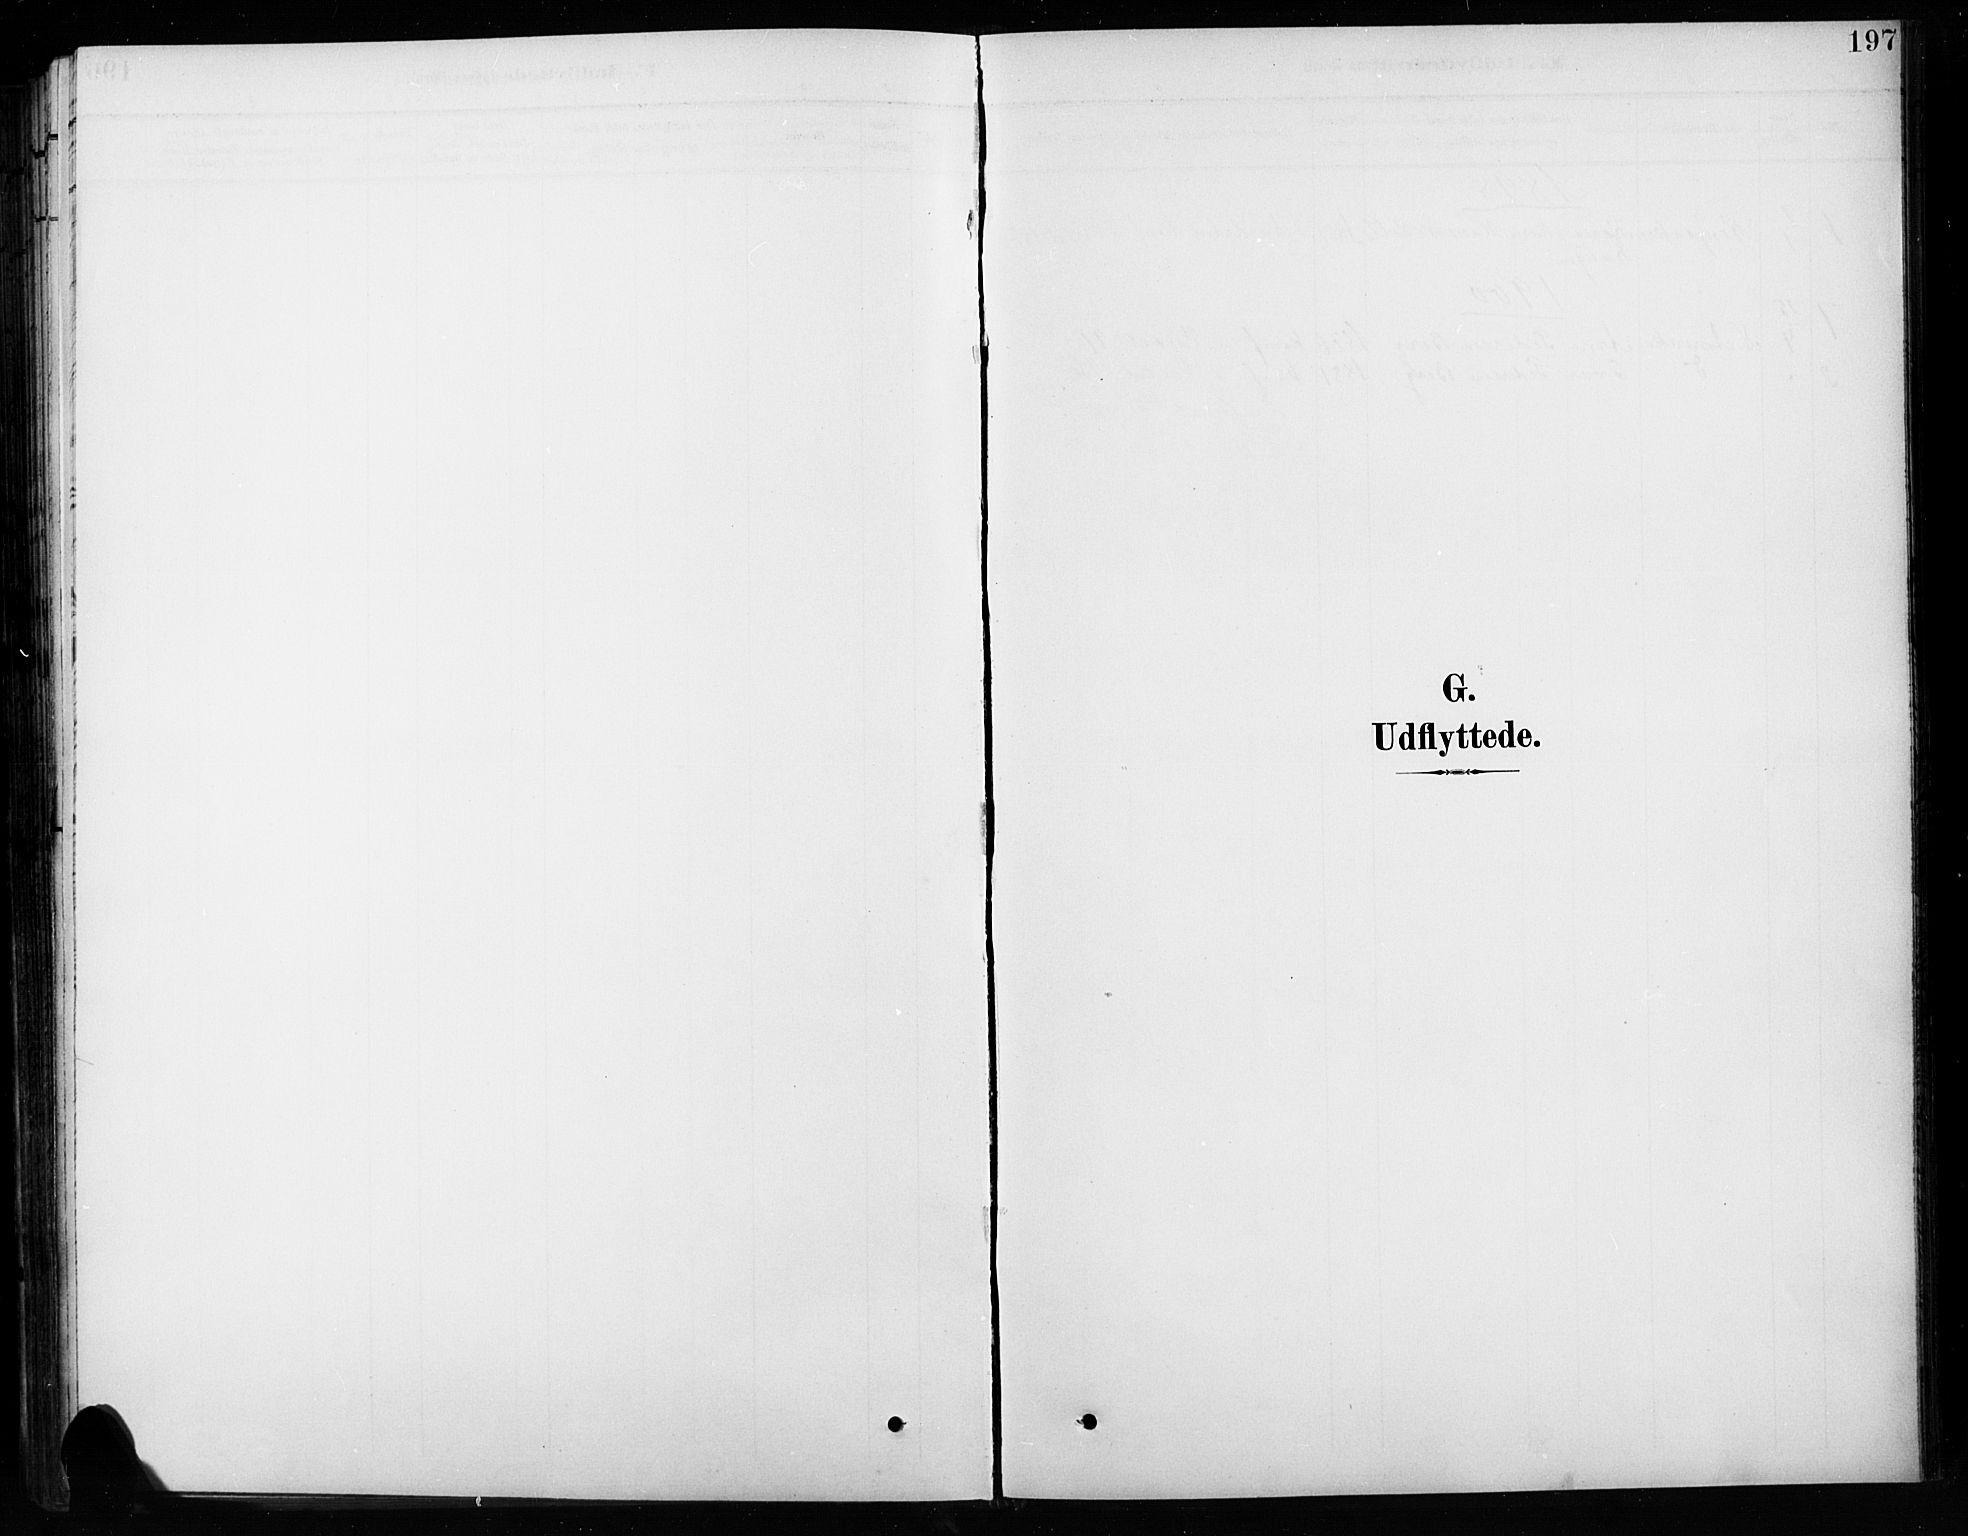 SAH, Vardal prestekontor, H/Ha/Hab/L0010: Klokkerbok nr. 10, 1895-1903, s. 197